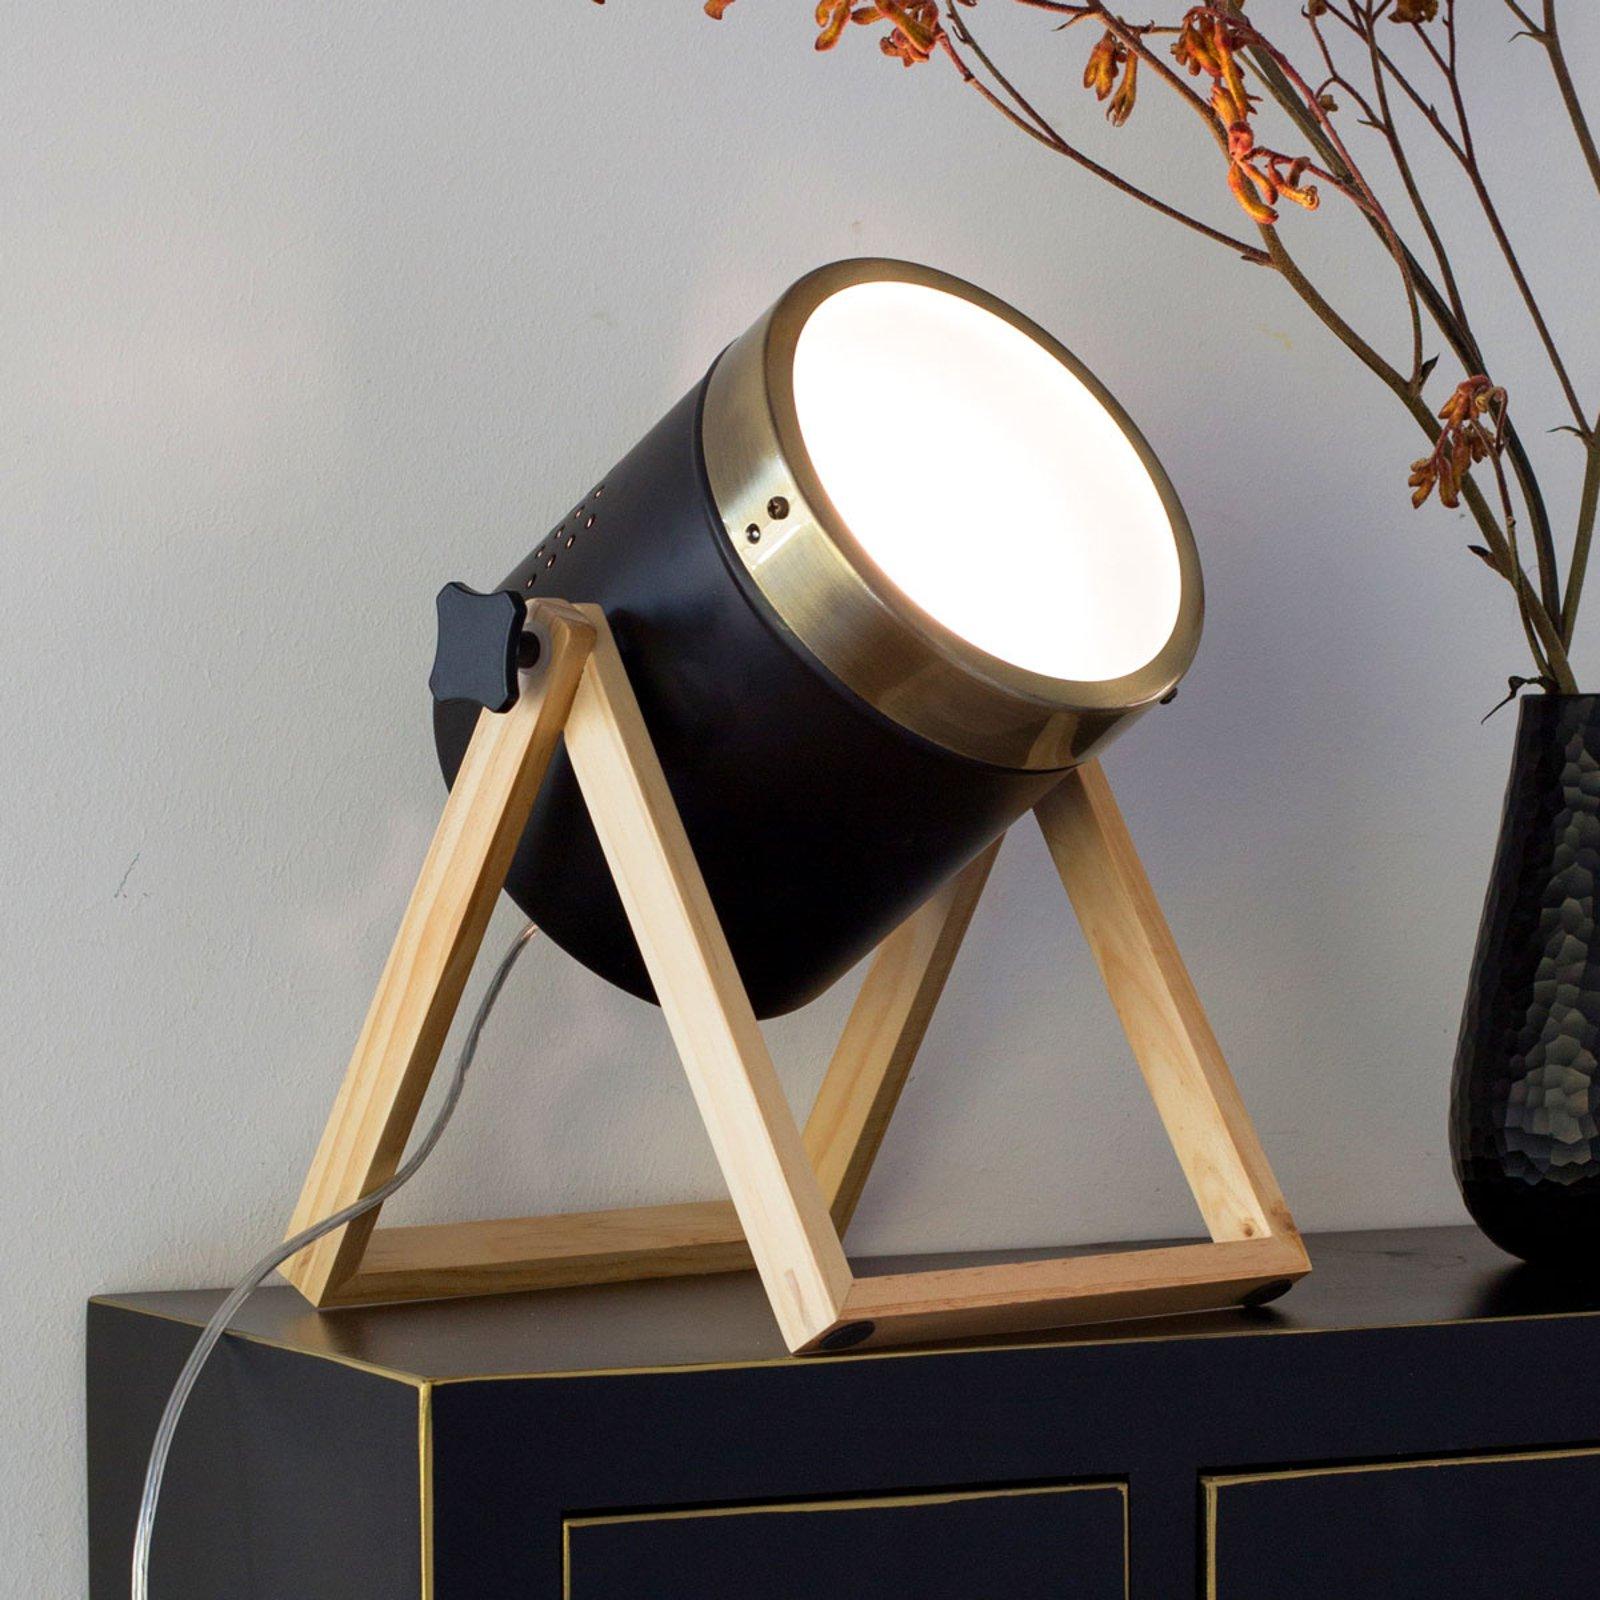 Bordlampe Tim svart, gull